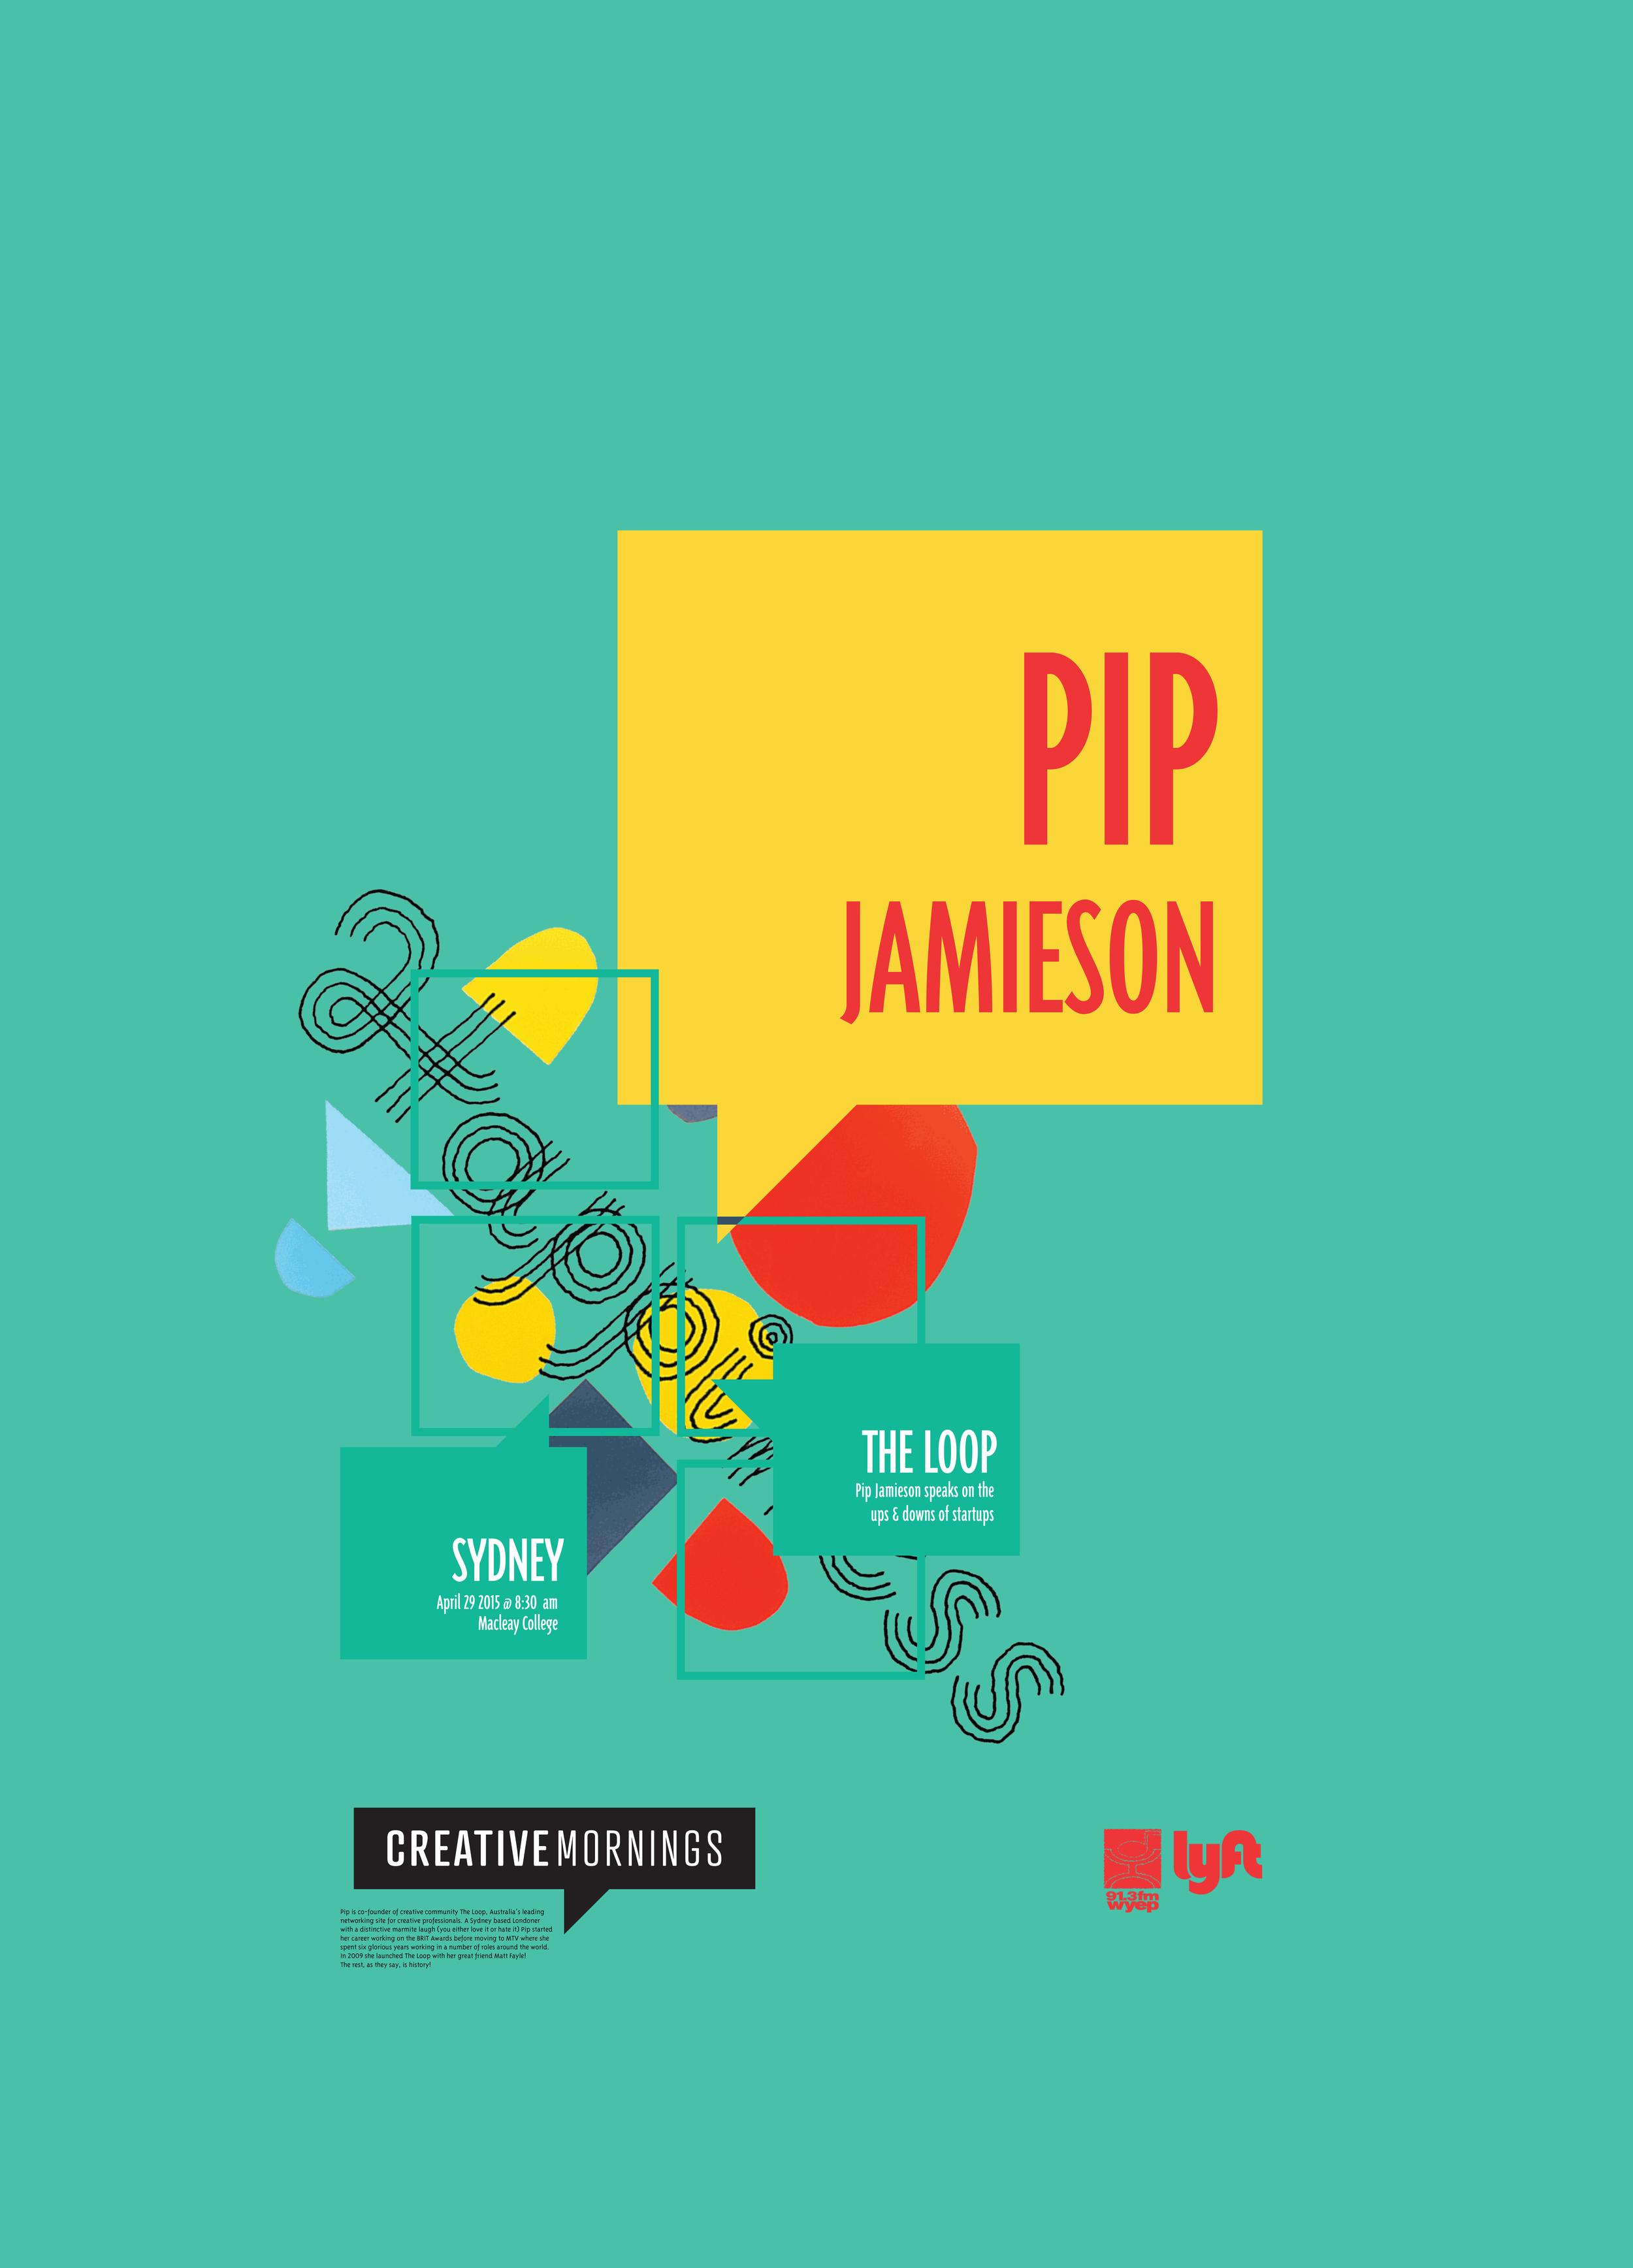 Pip Jamieson_Large FINAL.jpg